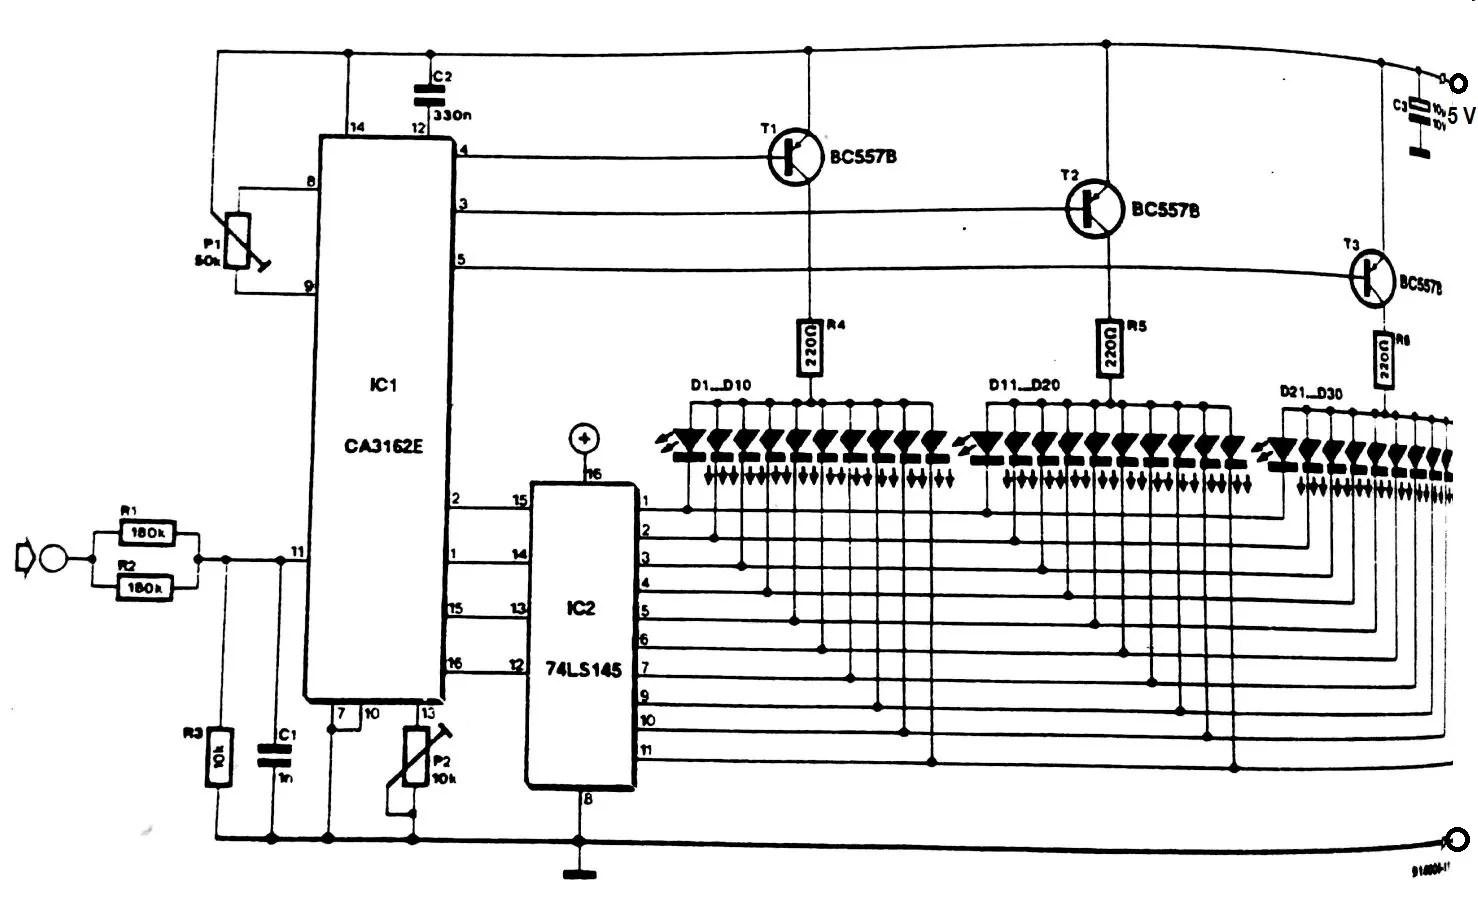 ez go wiring harness diagram 3 wheeler wiring diagram library ez go wiring harness diagram 3 wheeler simple wiring diagrams ez go solenoid diagram 1979 ez